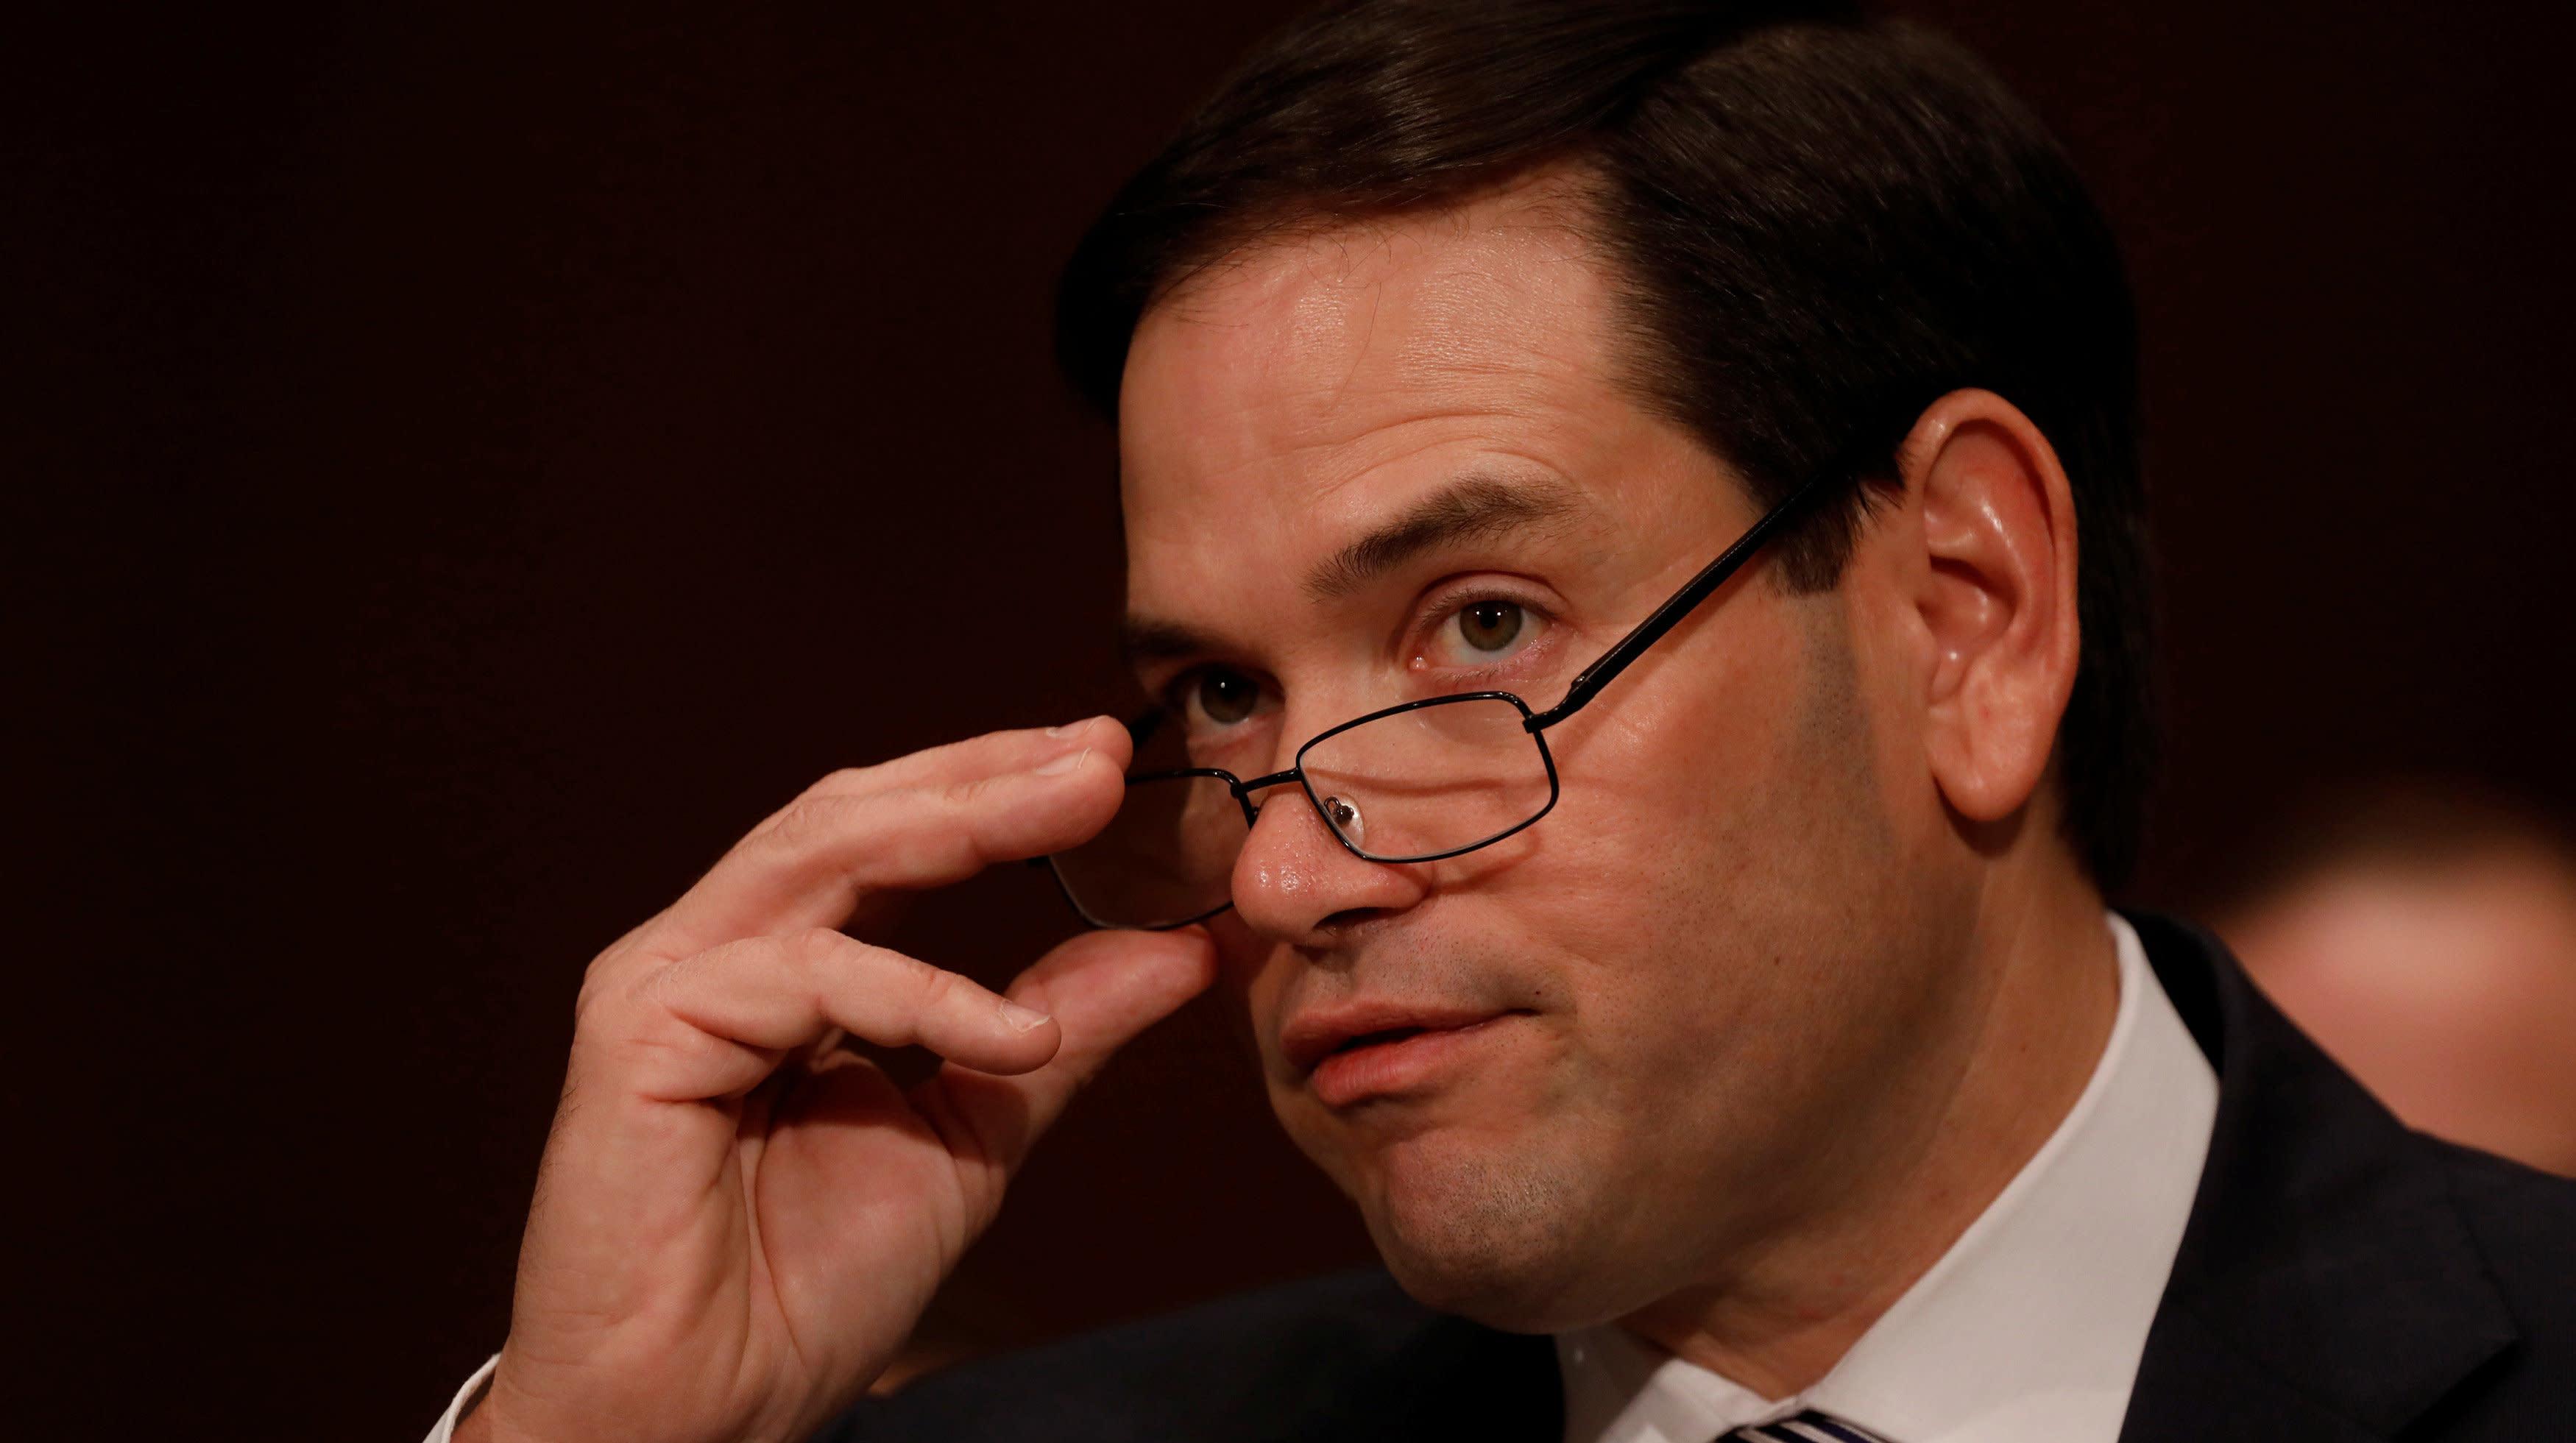 Marco Rubio Defends Democratic Colleague Over Misleading Fox News Report